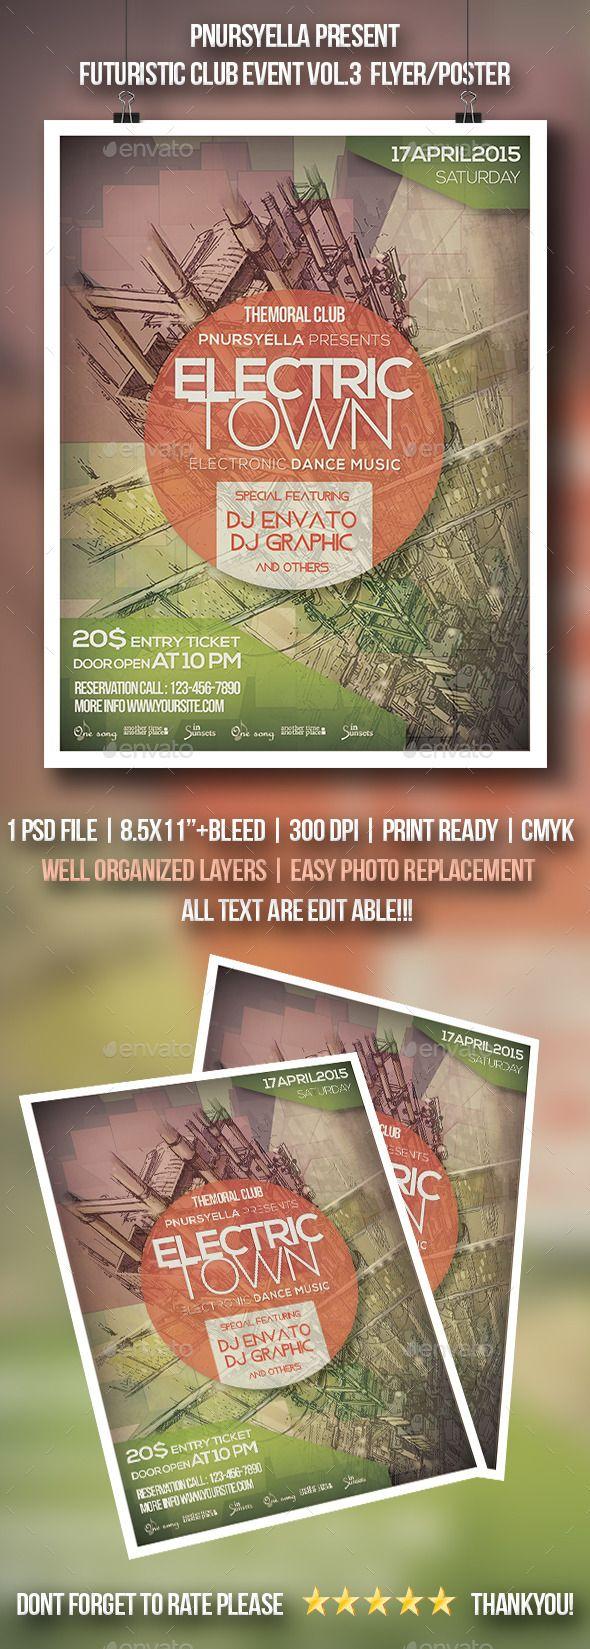 Futuristic Club Event  Flyer / Poster Vol.3